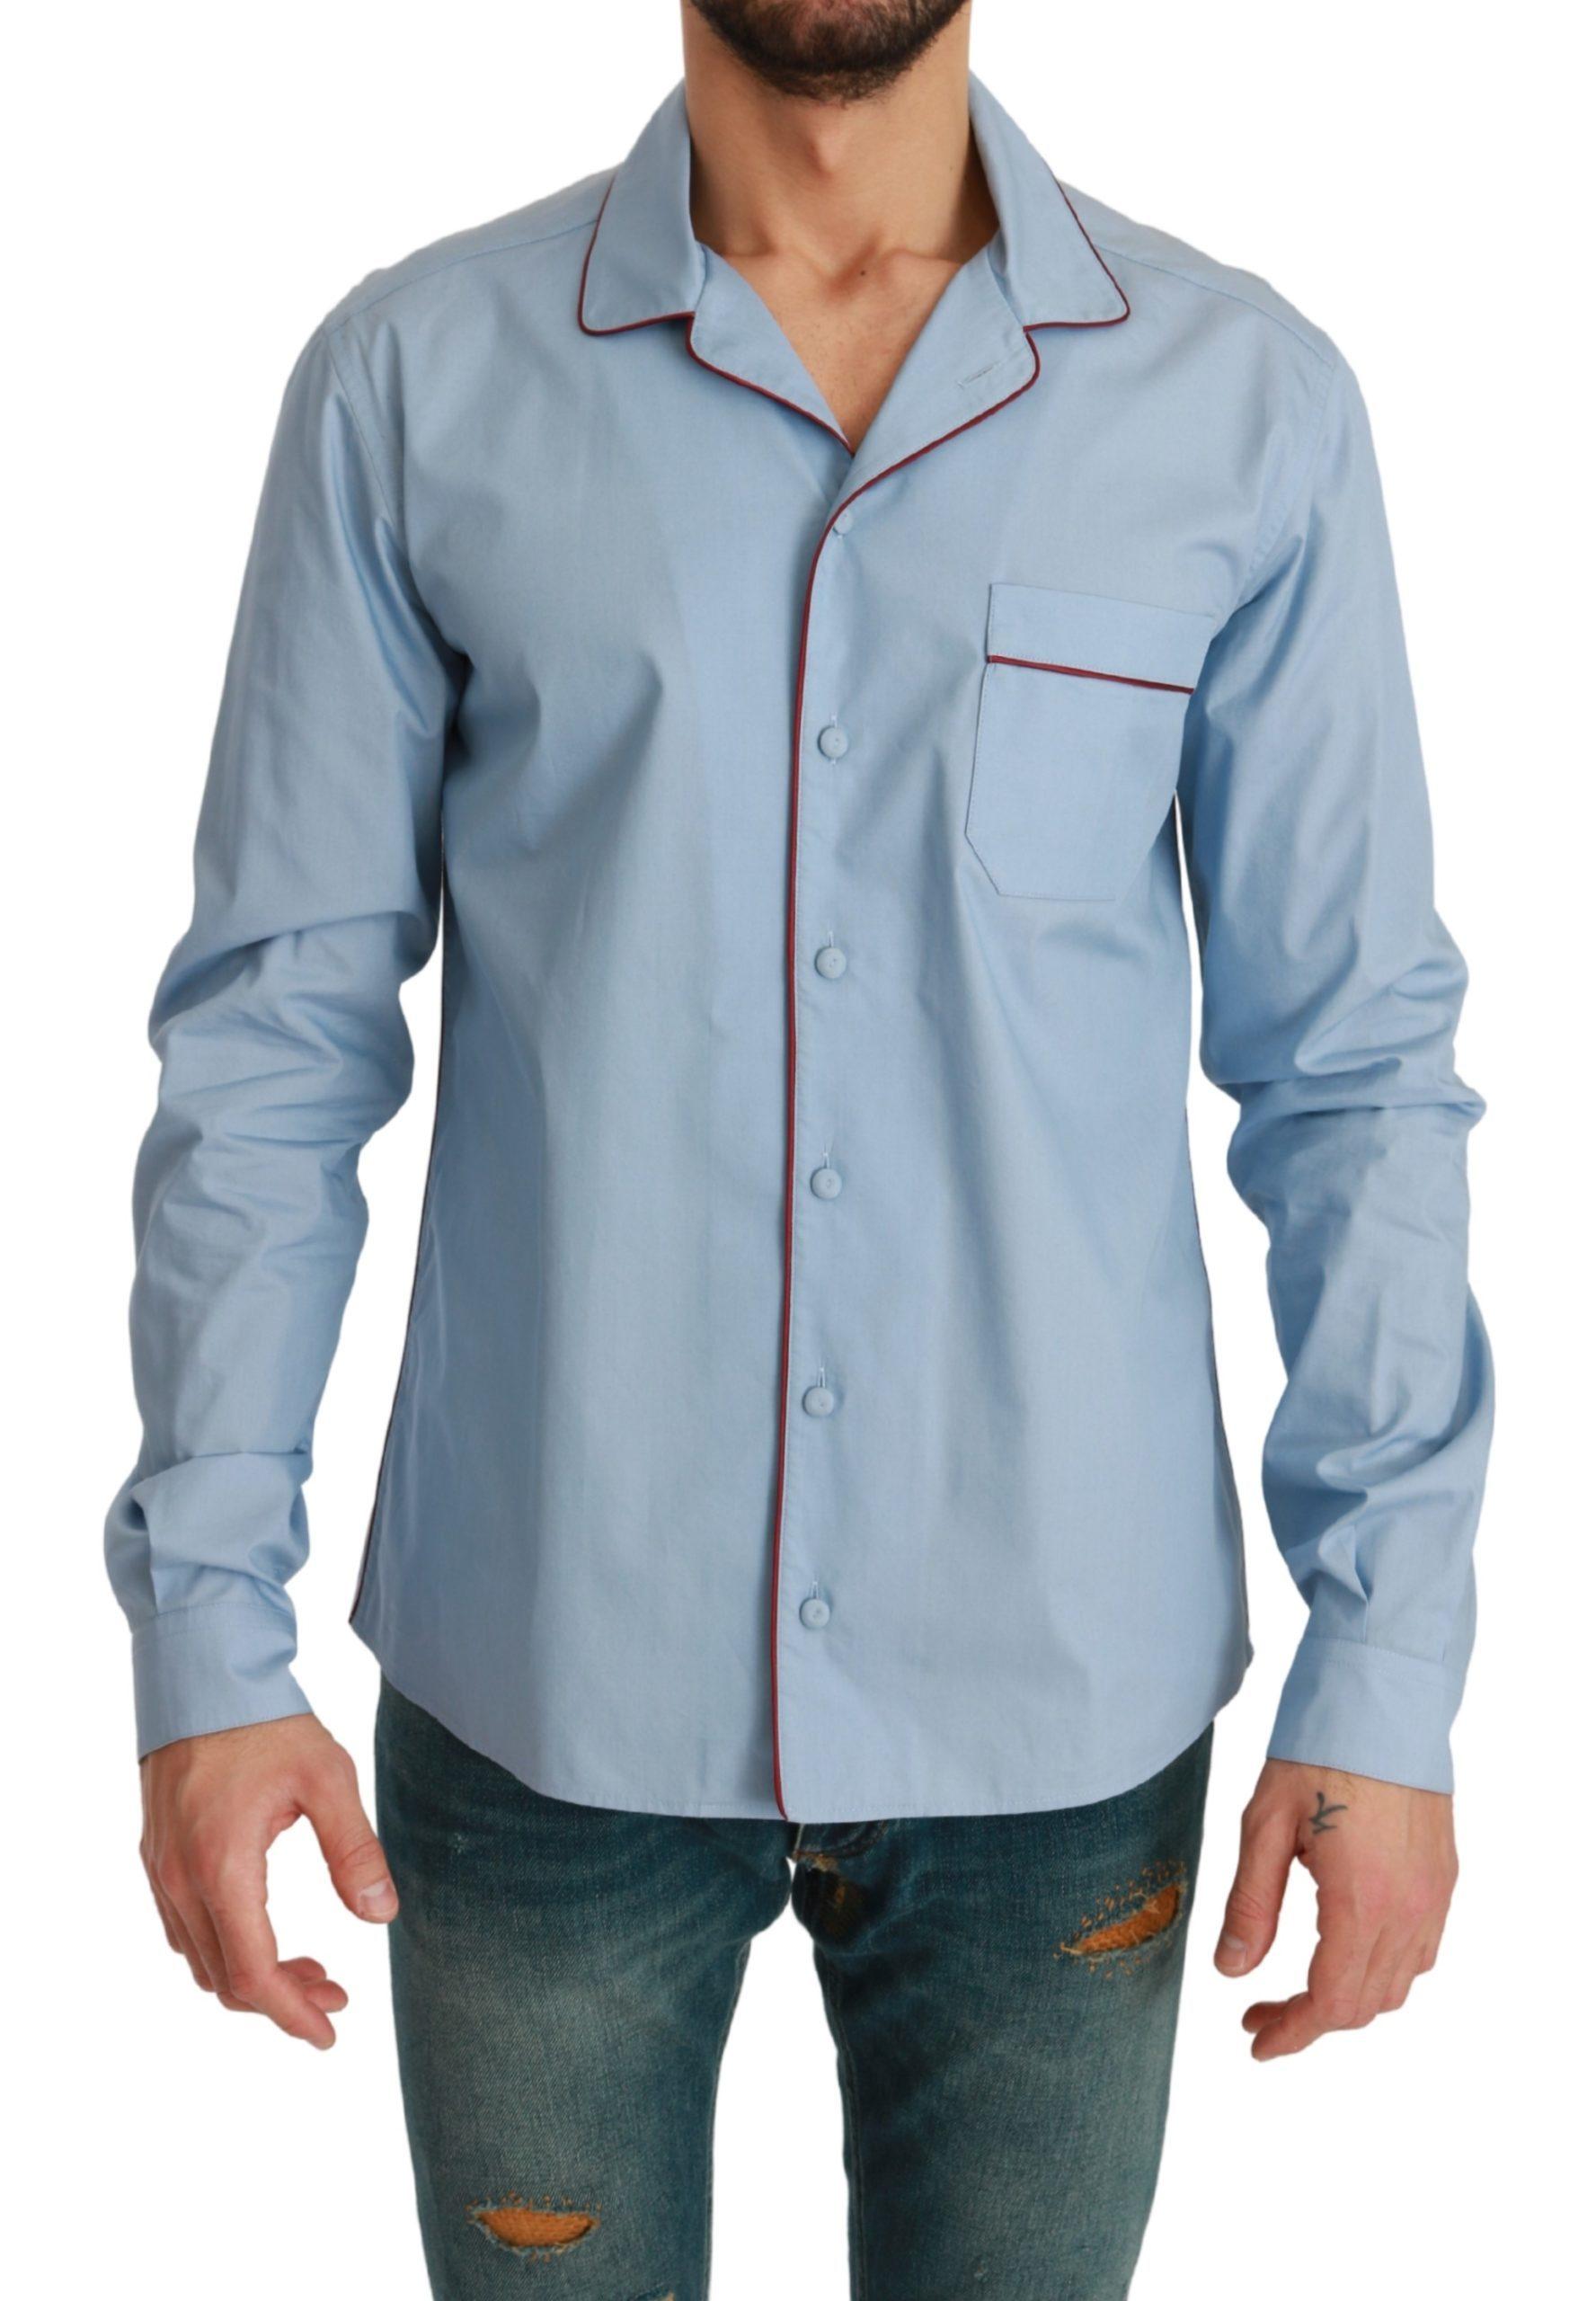 Dolce & Gabbana Men's Light Sleepwear Cotton Shirt Blue TSH4615 - IT40 | M